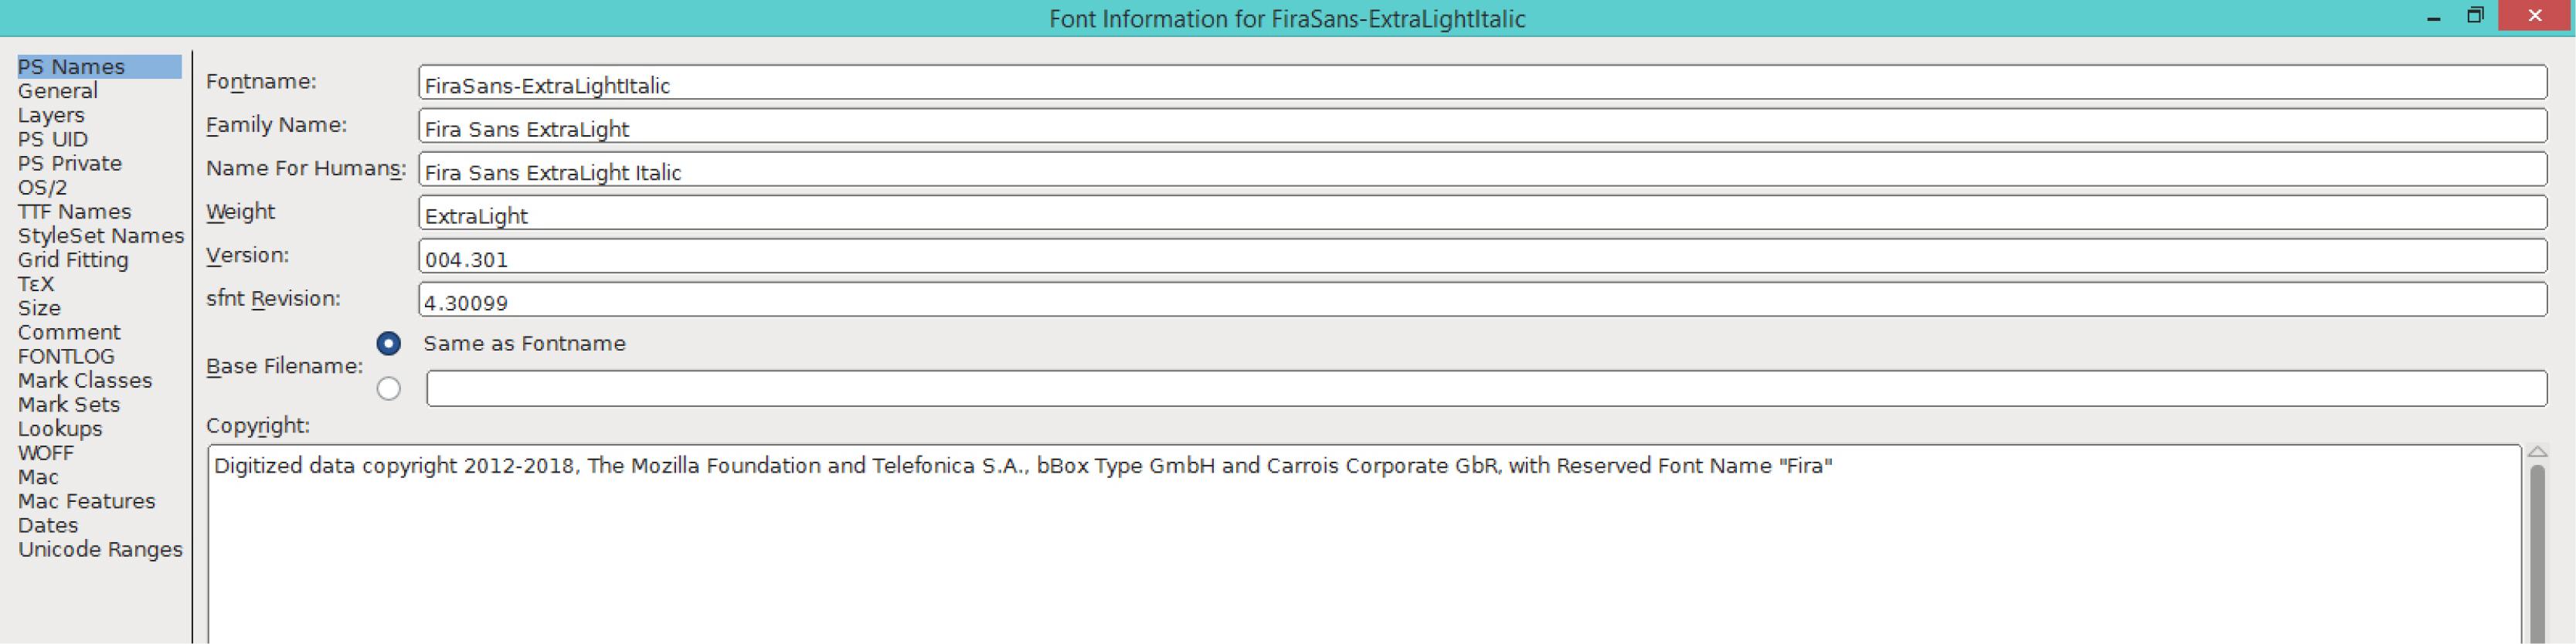 Fira Sans ExtraLight Italic (PS)